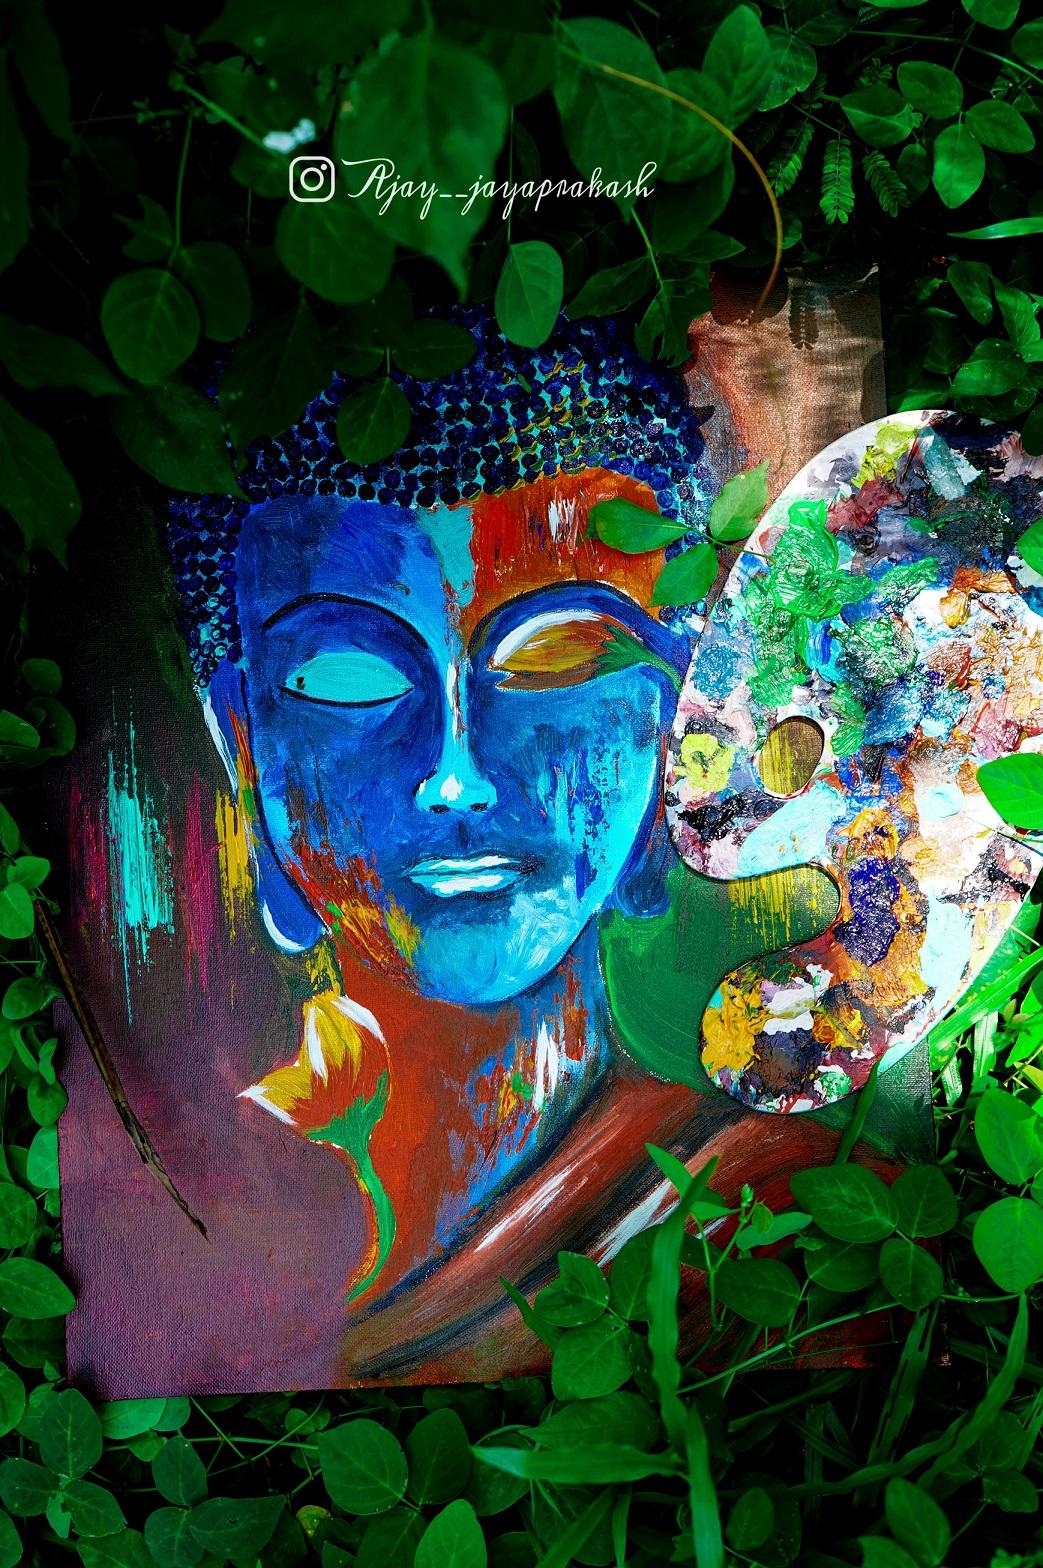 The Buddha image 1